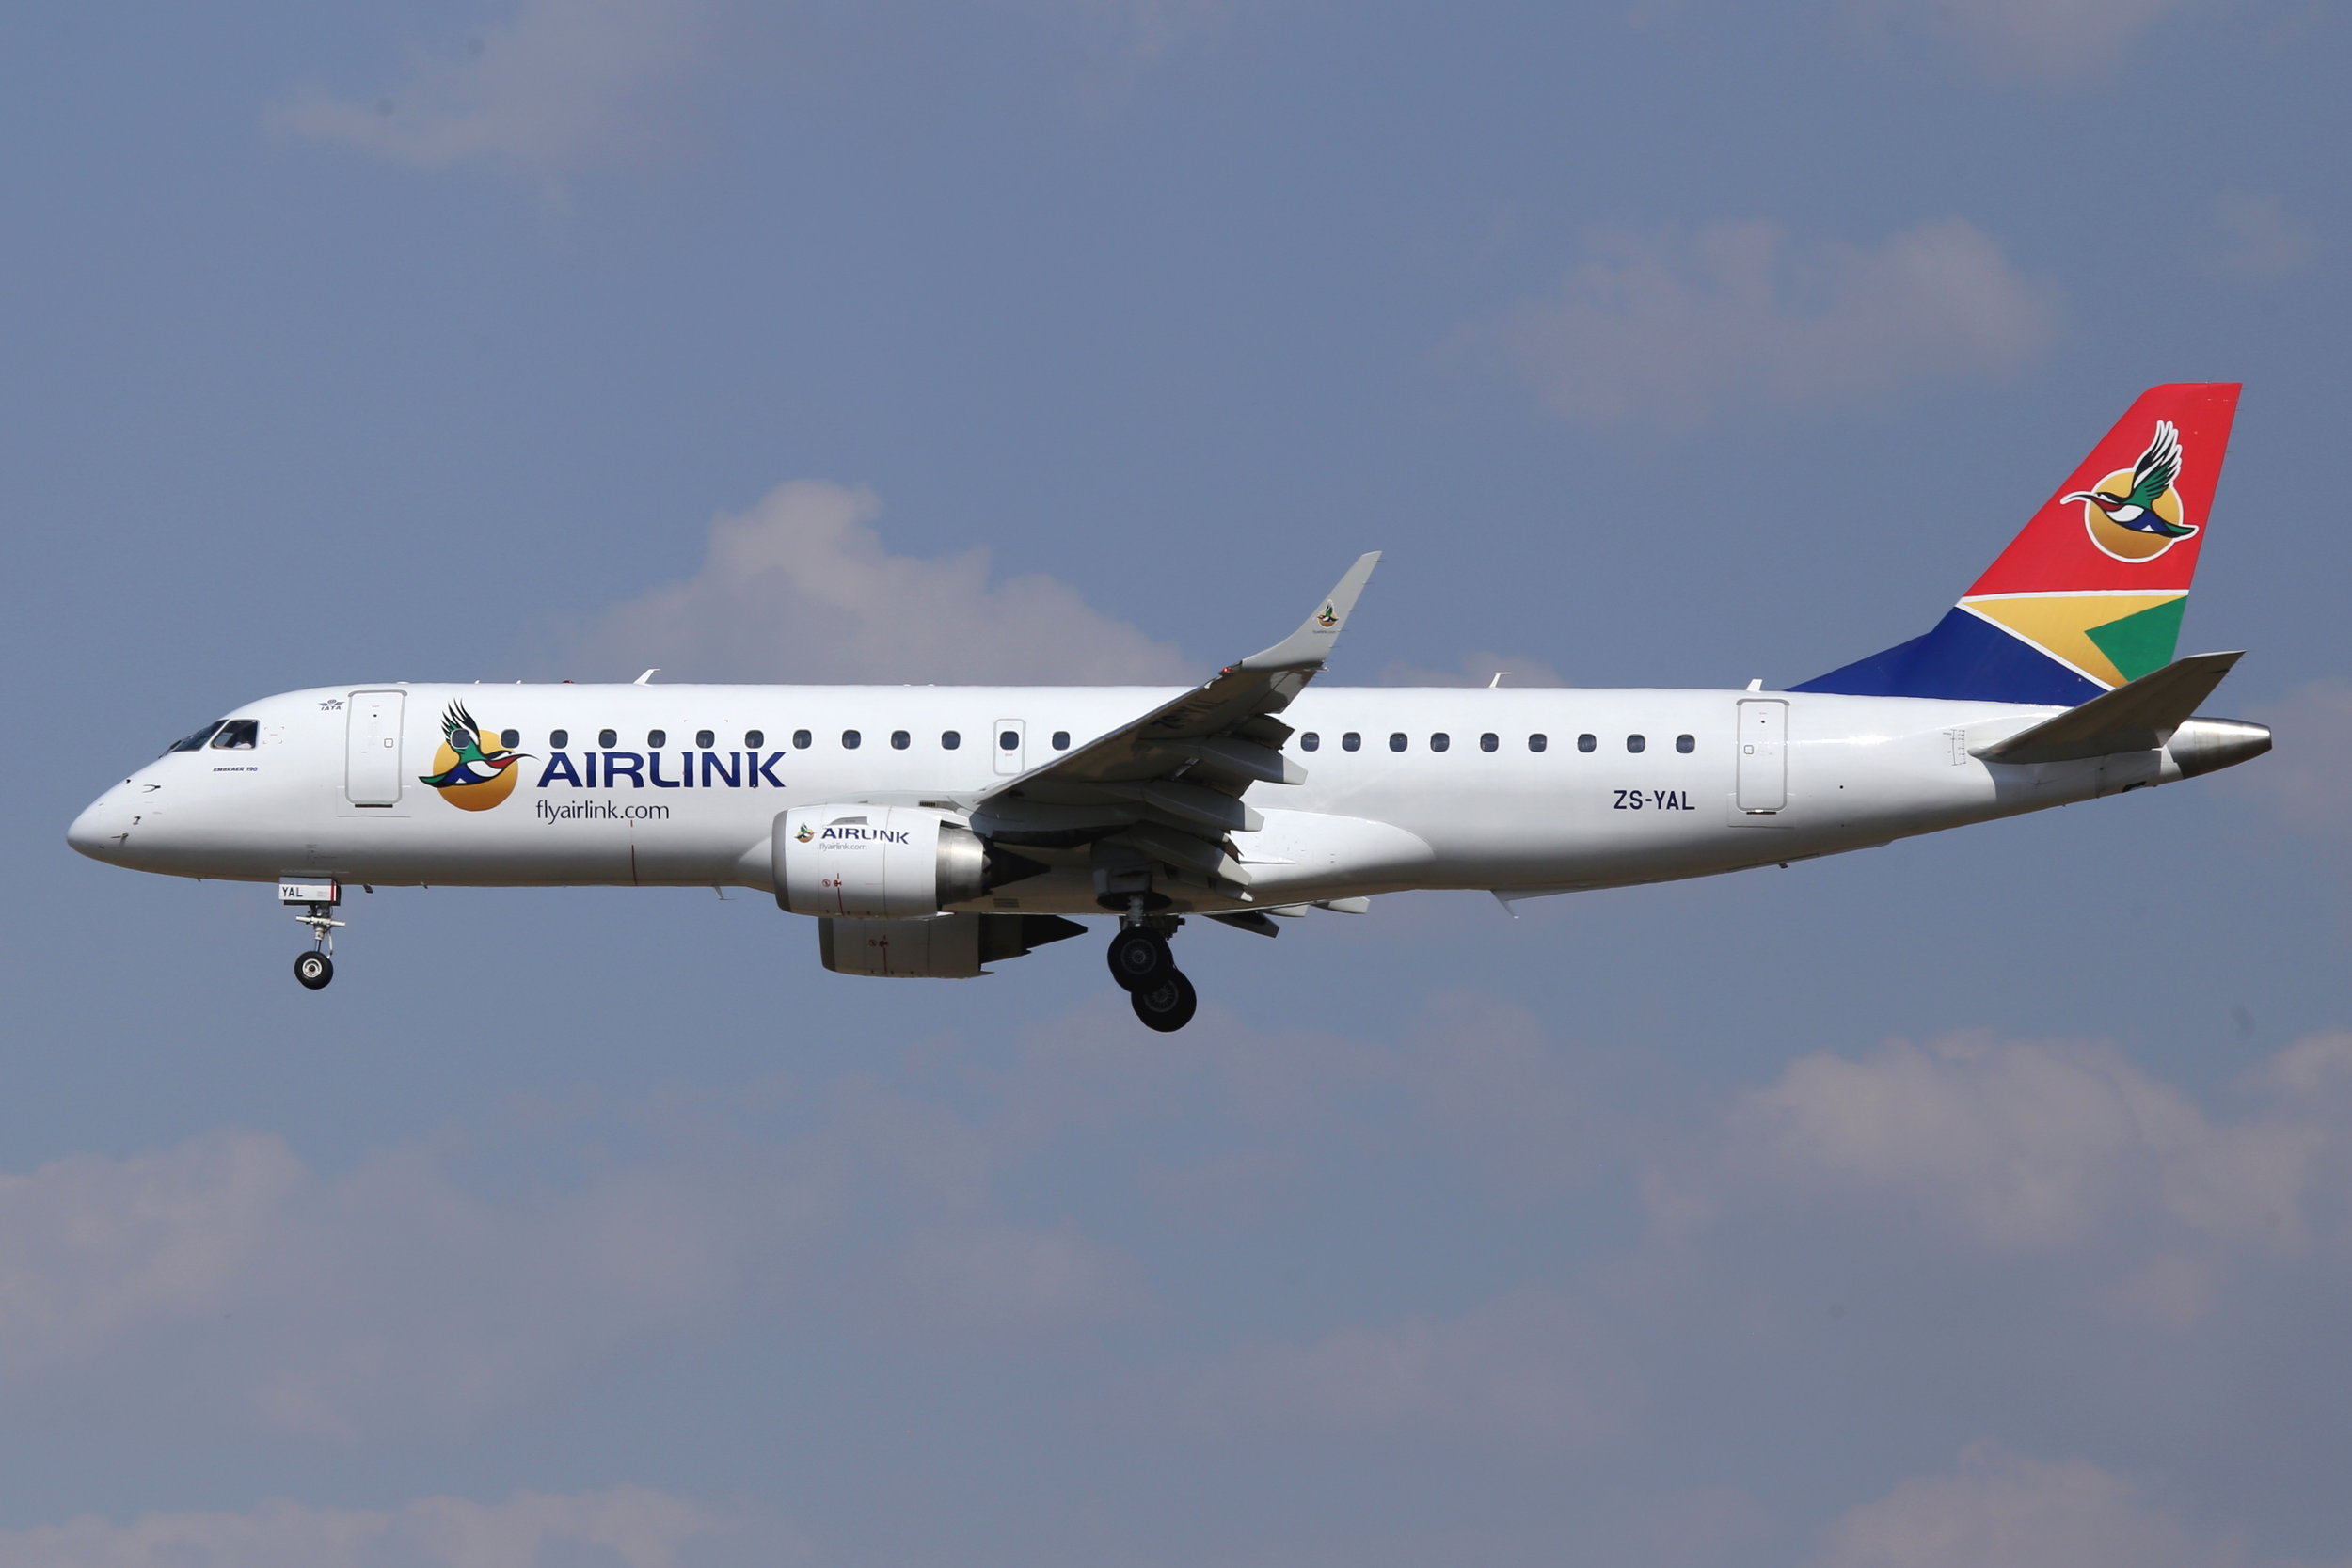 ZS-YAL SAA Airlink Embraer 190 taken at Johannesburg 10th November 2018 by John Wood